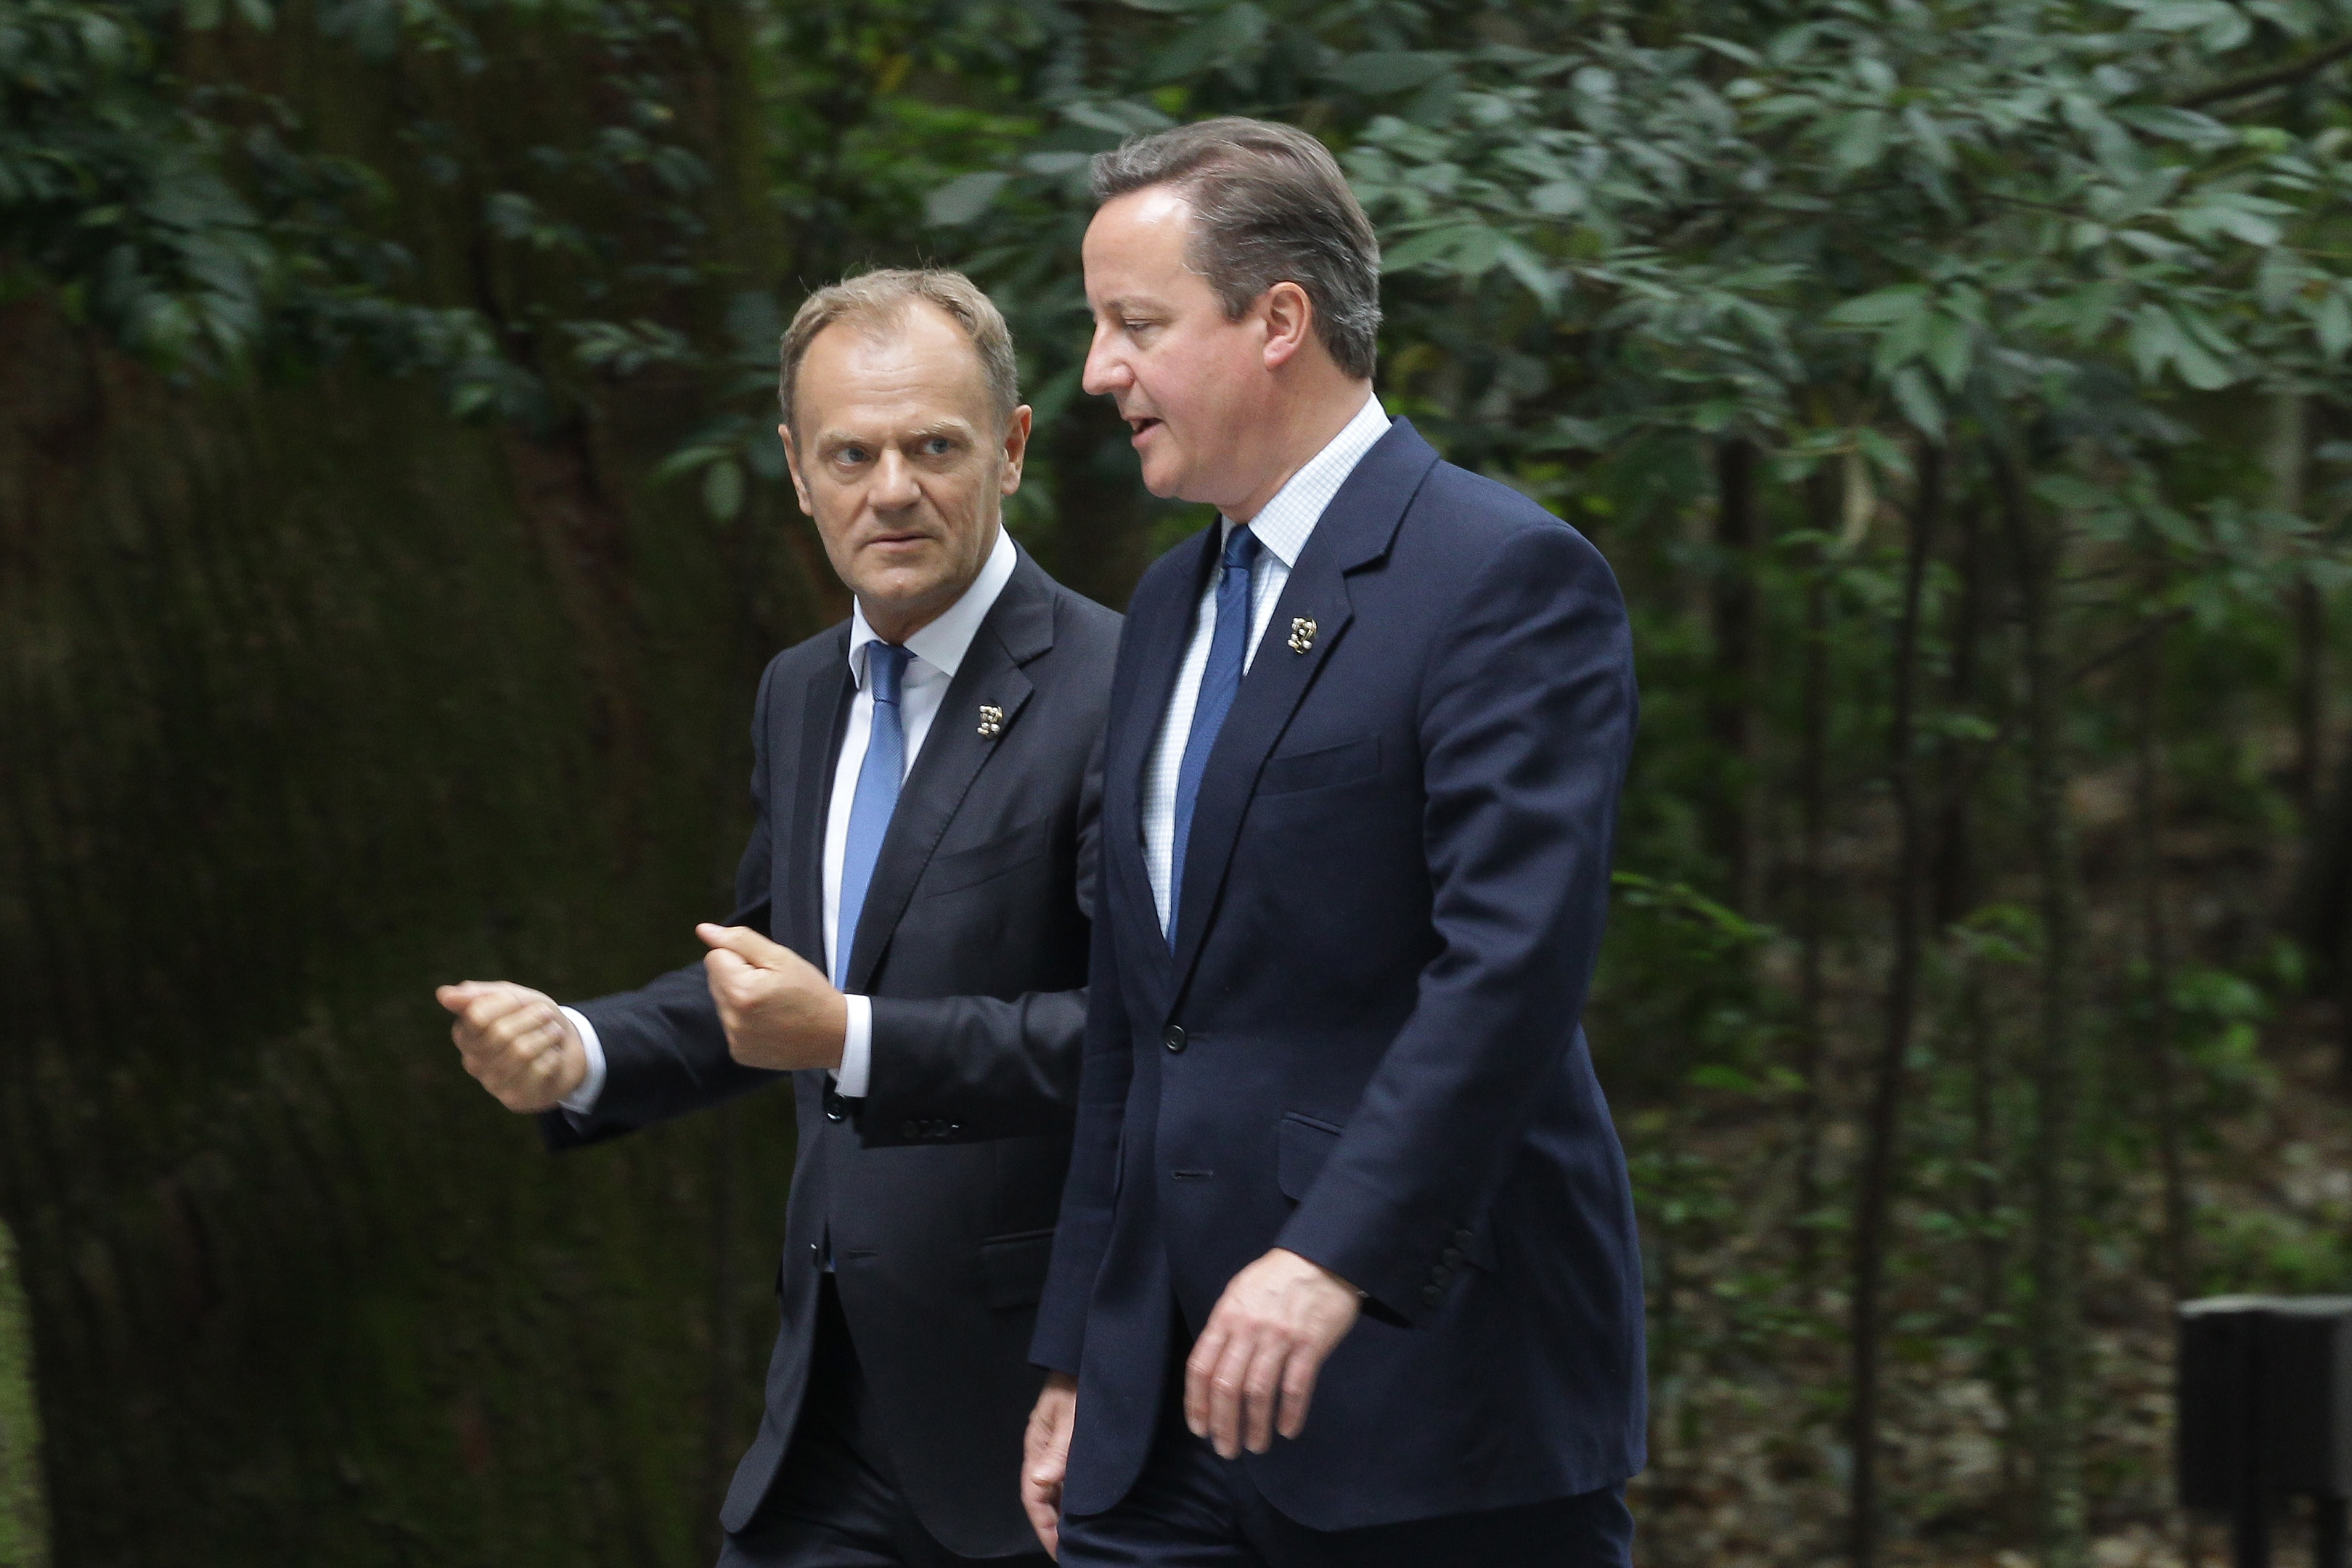 European Council President Donald Tusk talks with Prime Minister David Cameron.